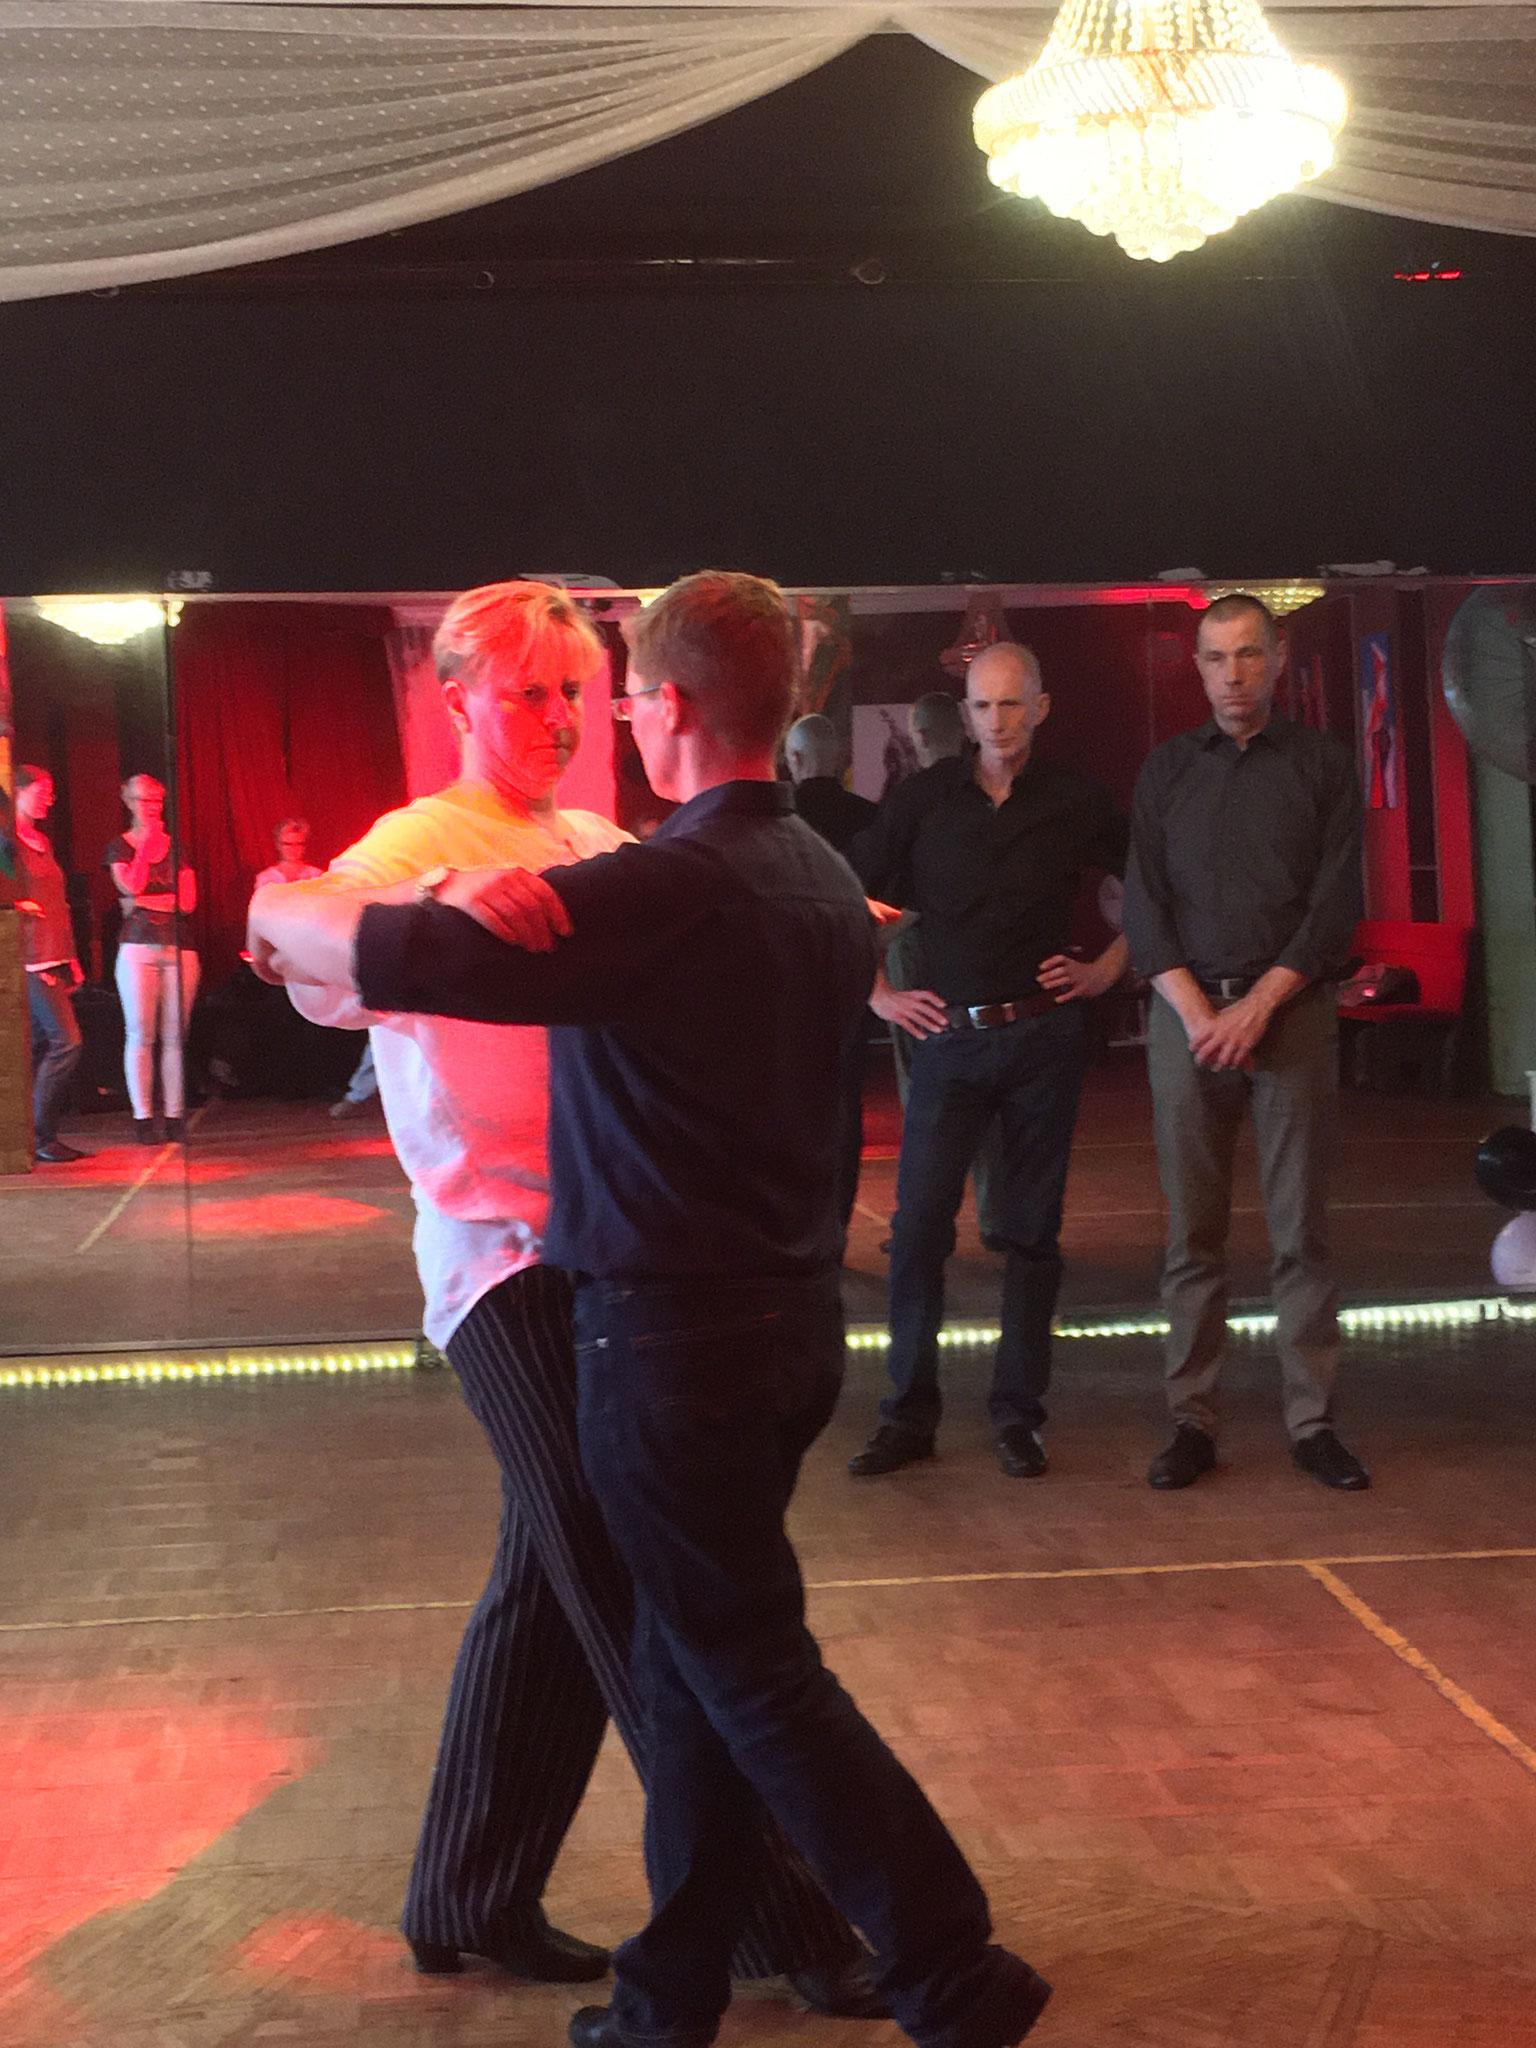 Tanzsaal der Tango Chocolate Tanzschule HH_ St. Georg - TanzTakt 1x im Monat (Pic by Denise Lau)